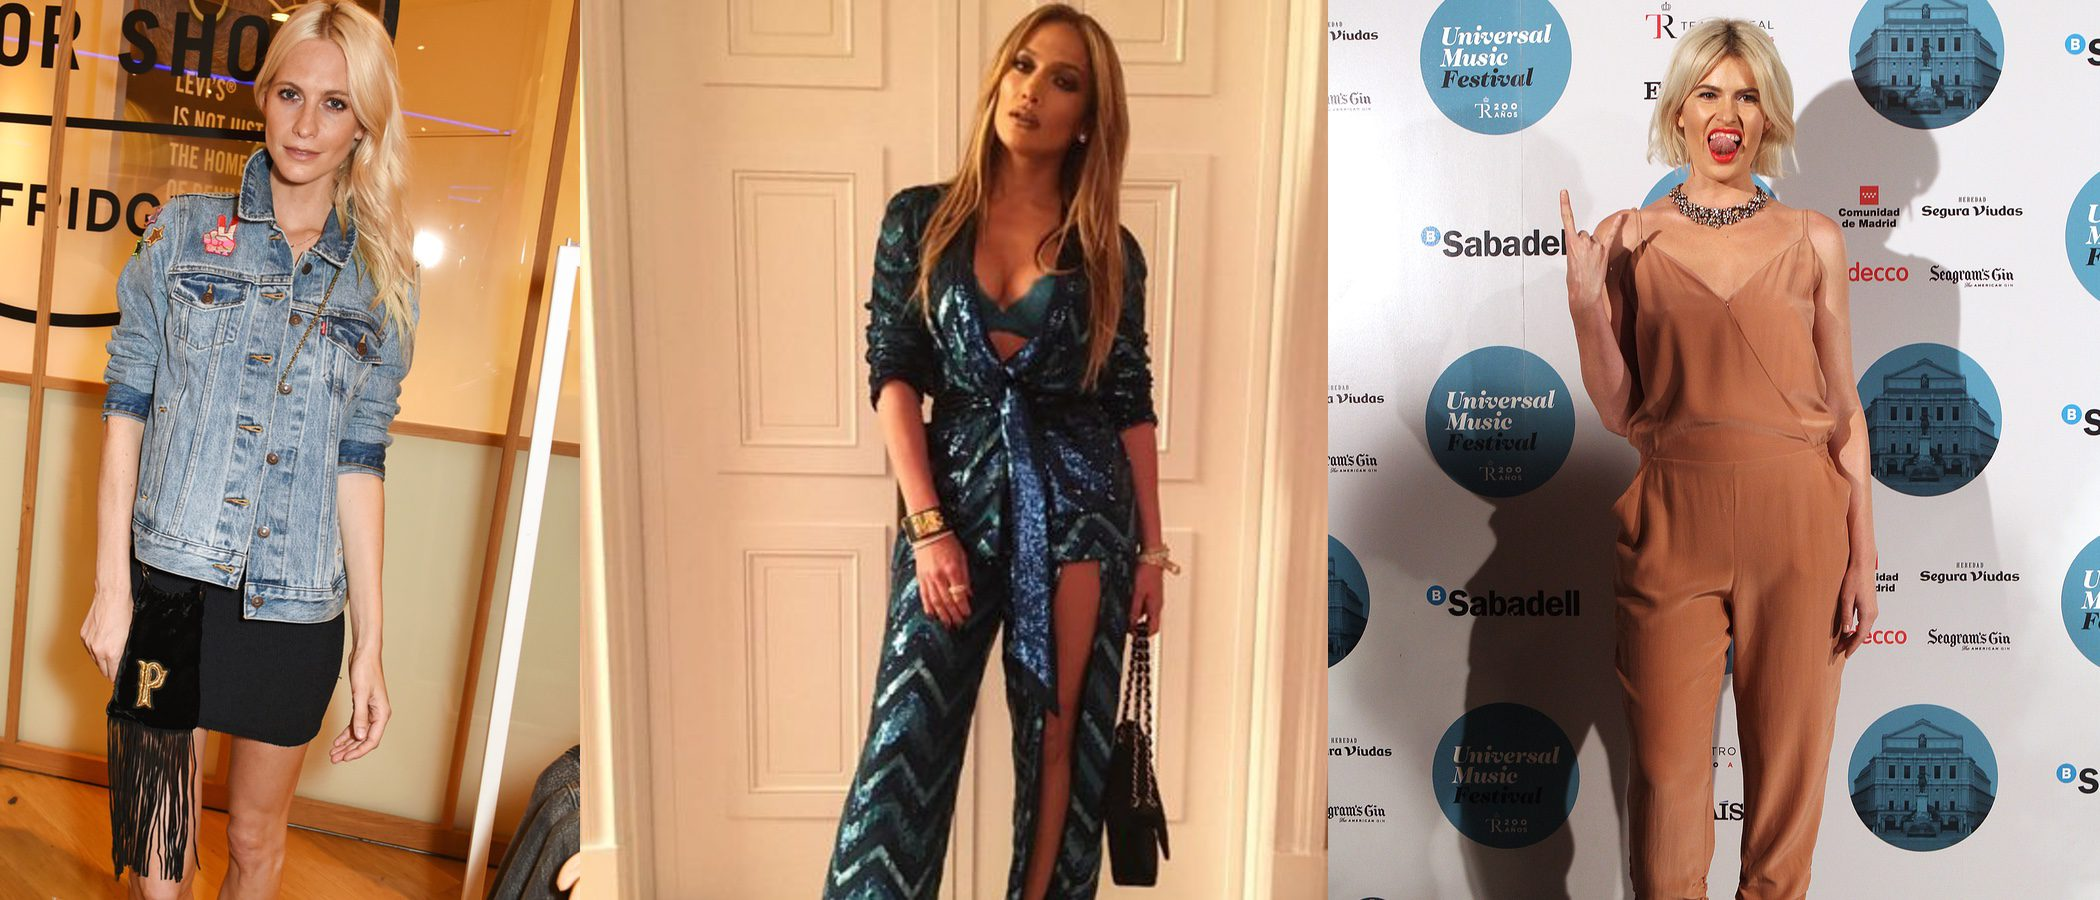 Adriana Abenia, Poppy Delevinge y Jennifer Lopez triunfan como mejor vestidas